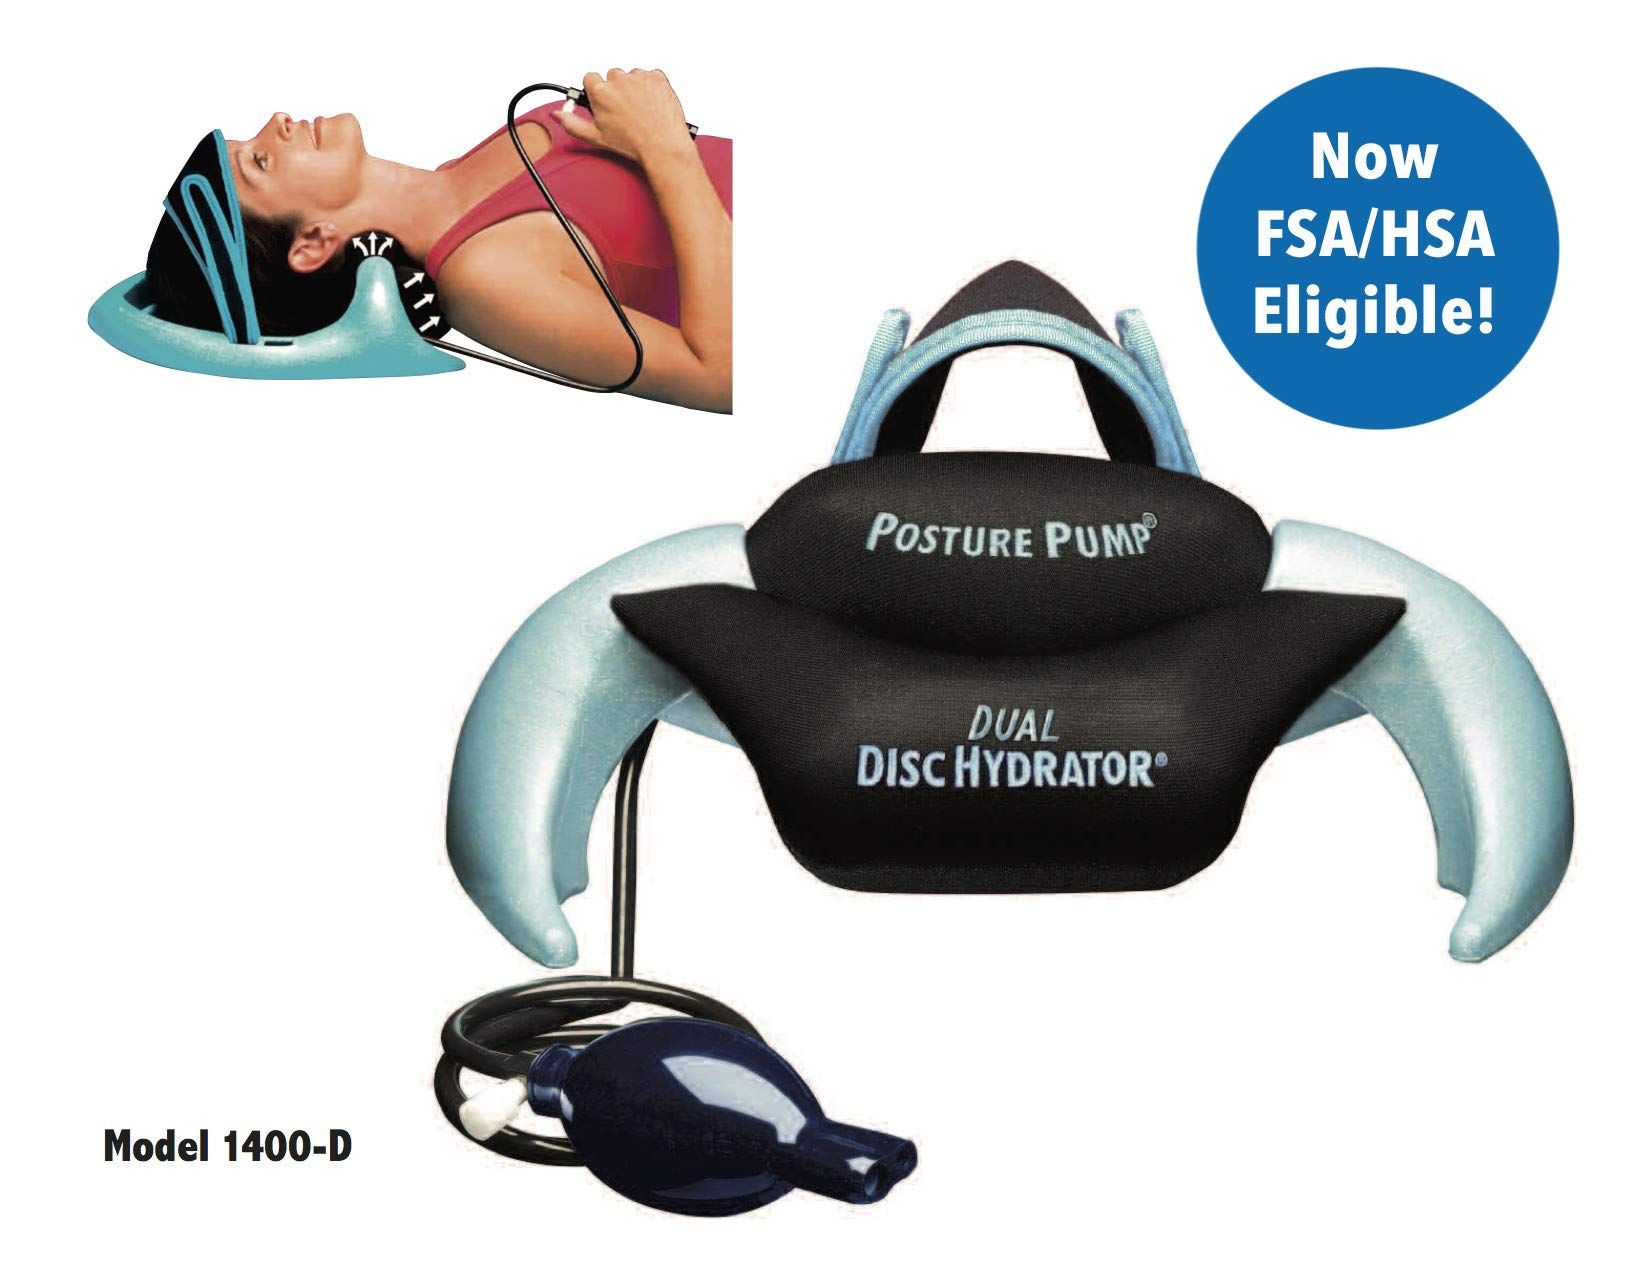 Posture Pump® 1400-D (Dual Disc Hydrator®)